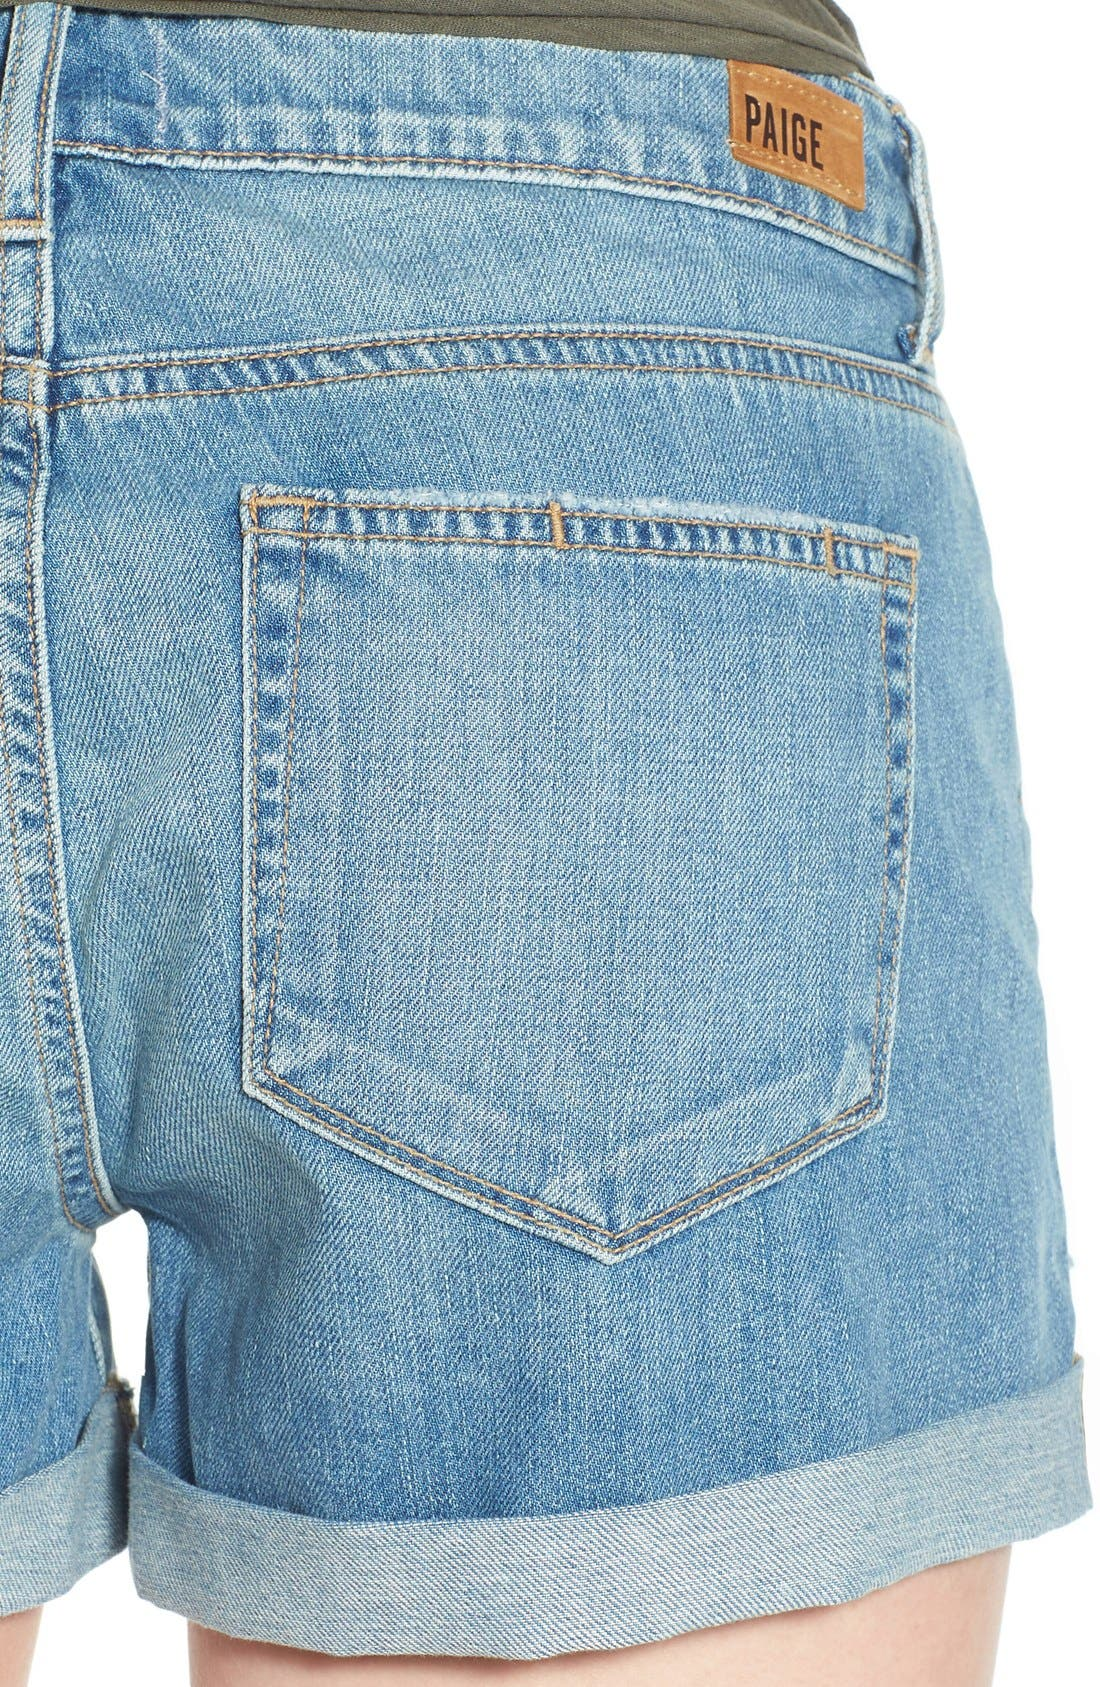 Alternate Image 4  - PAIGE 'Jimmy Jimmy' Denim Shorts (Annora)